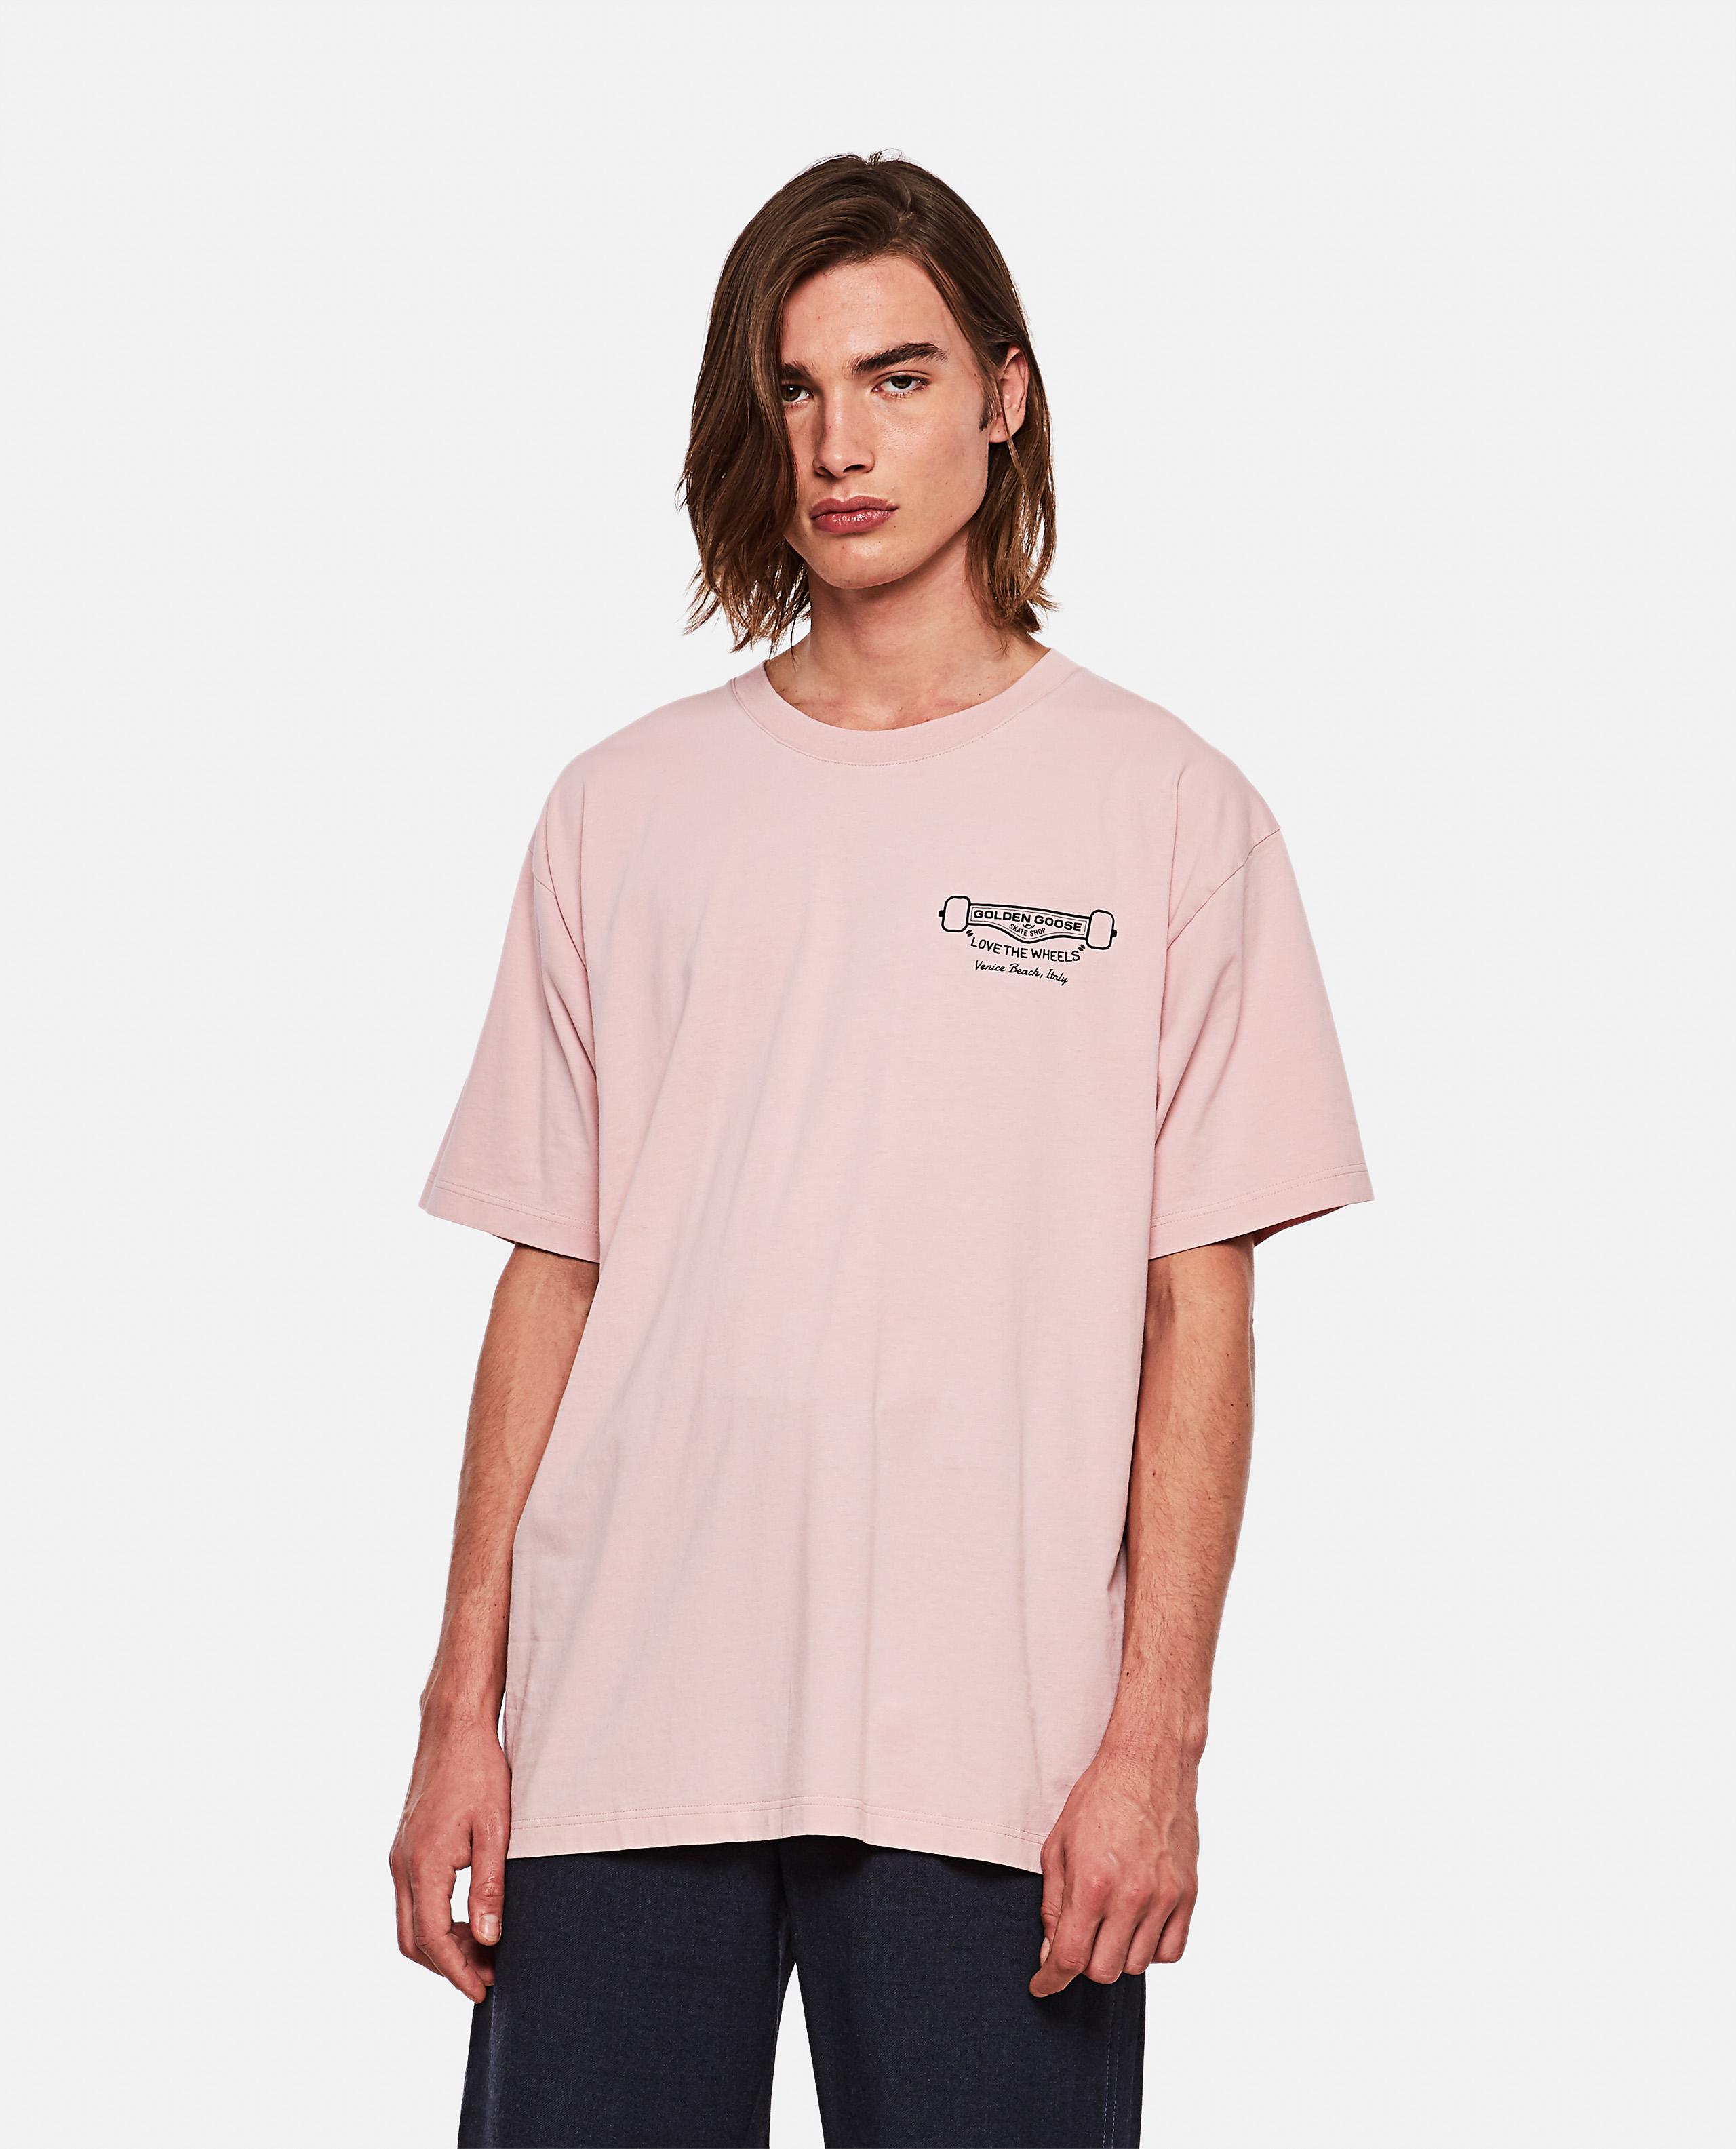 Love The Wheels printed t-shirt